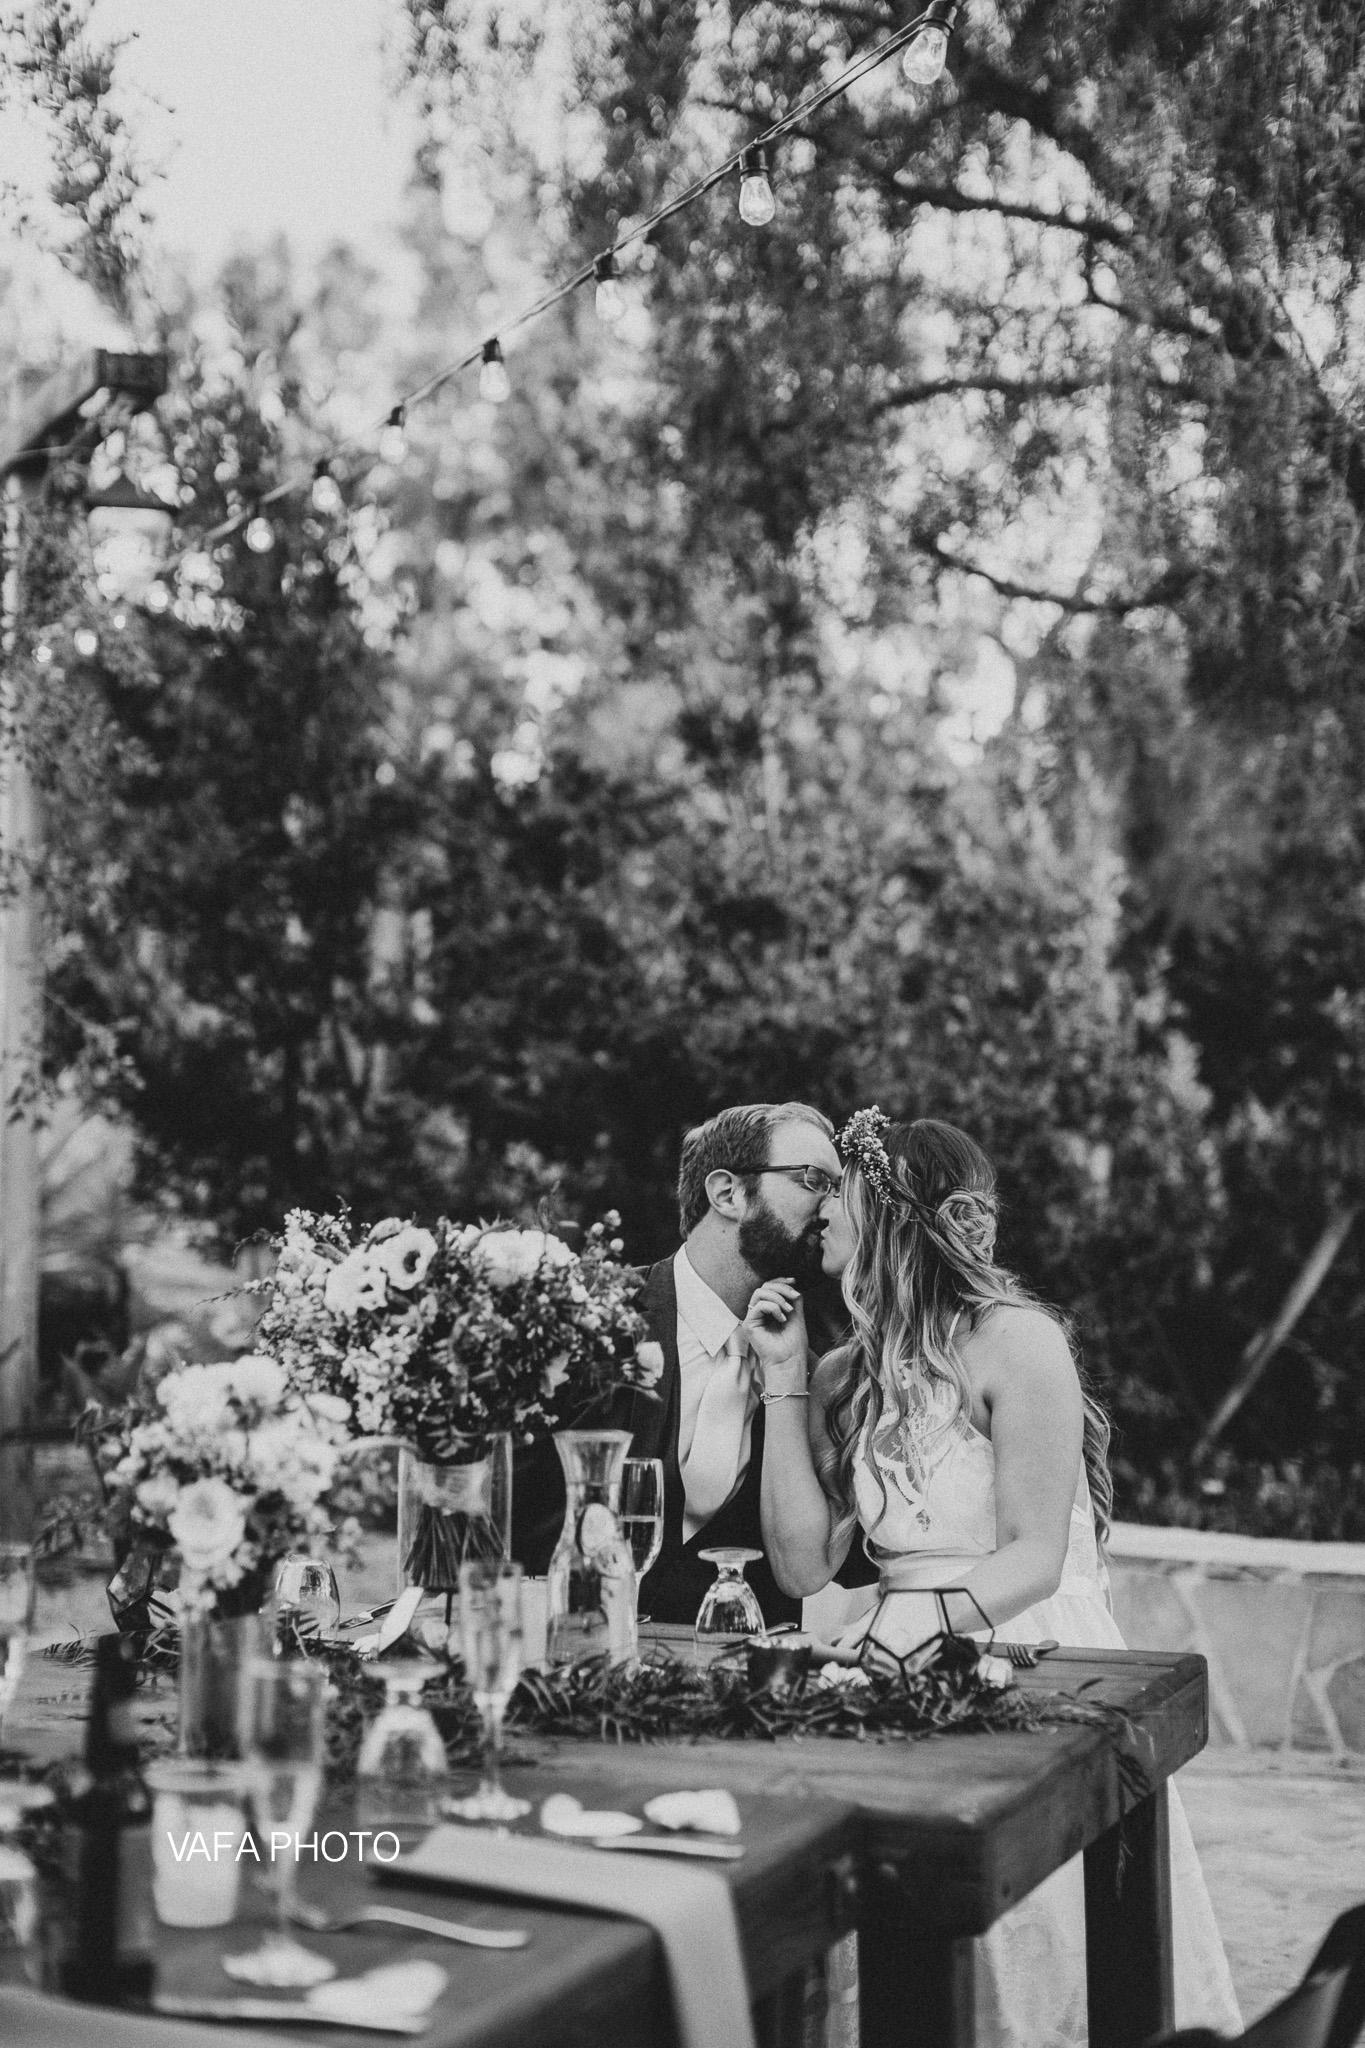 Leo-Carrillo-Ranch-Wedding-Lauren-Mike-Vafa-Photo-1044.jpg